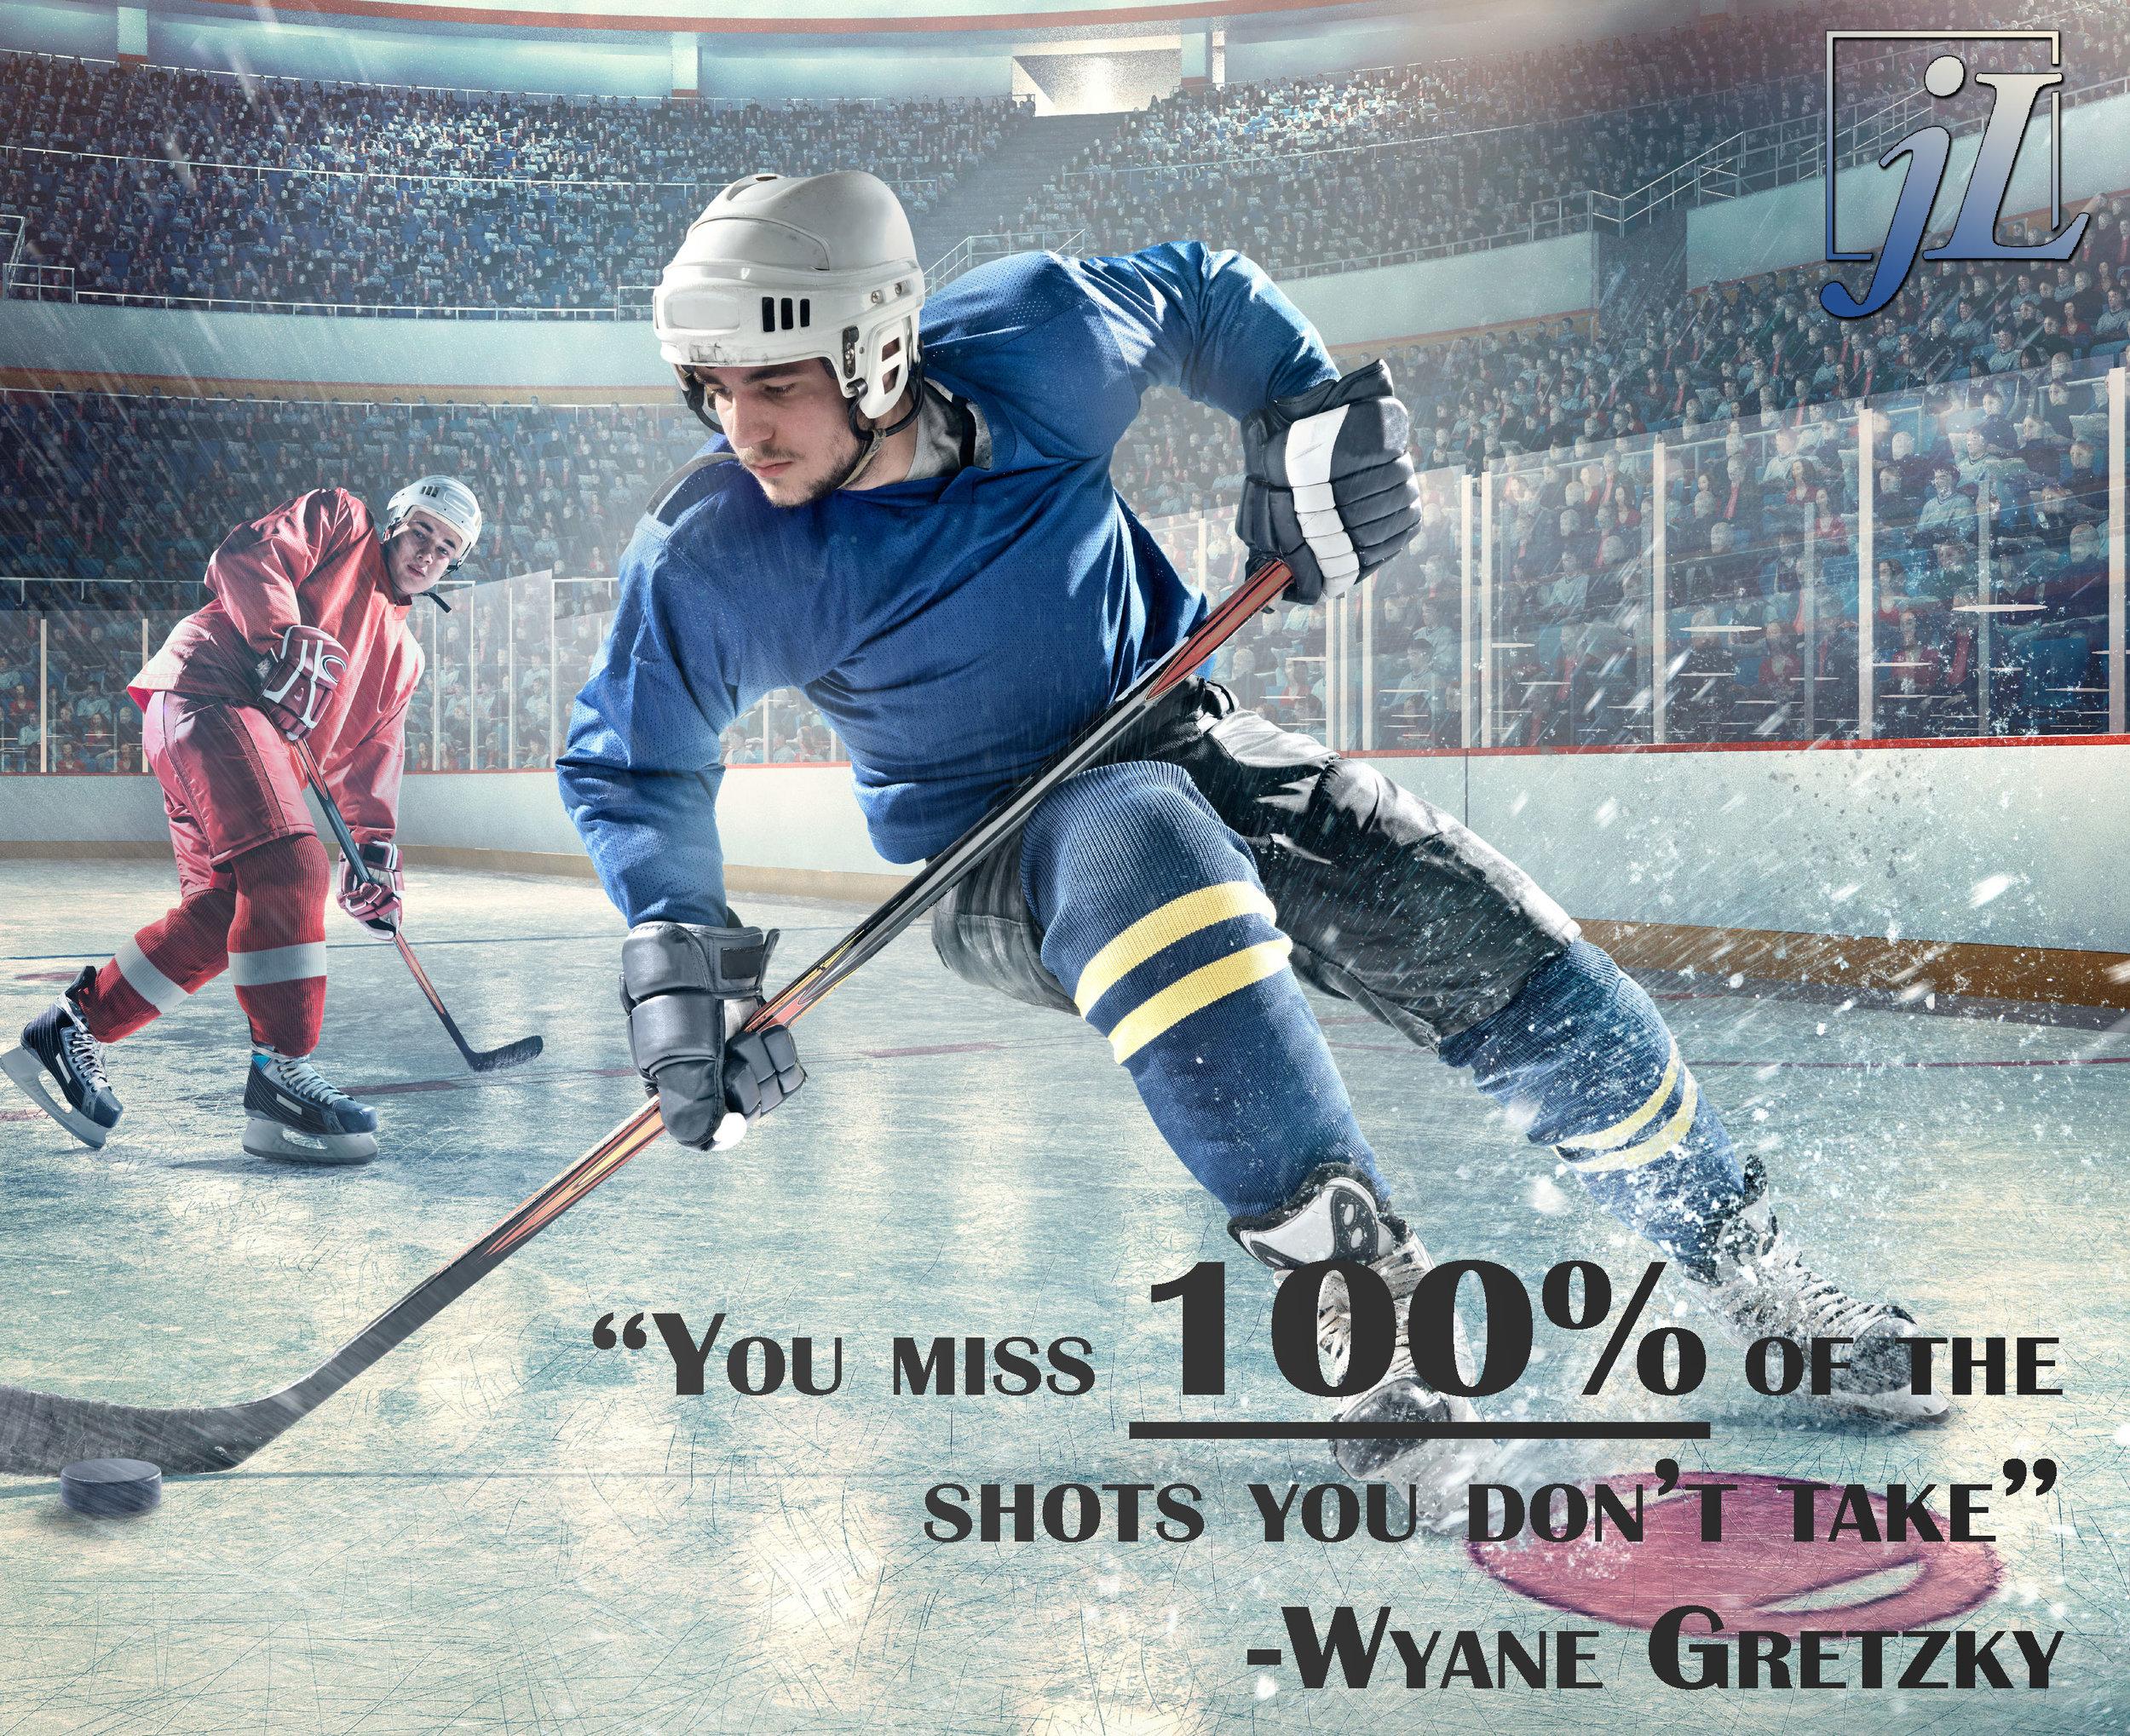 iStock-487831802-Hockey-Players.jpg